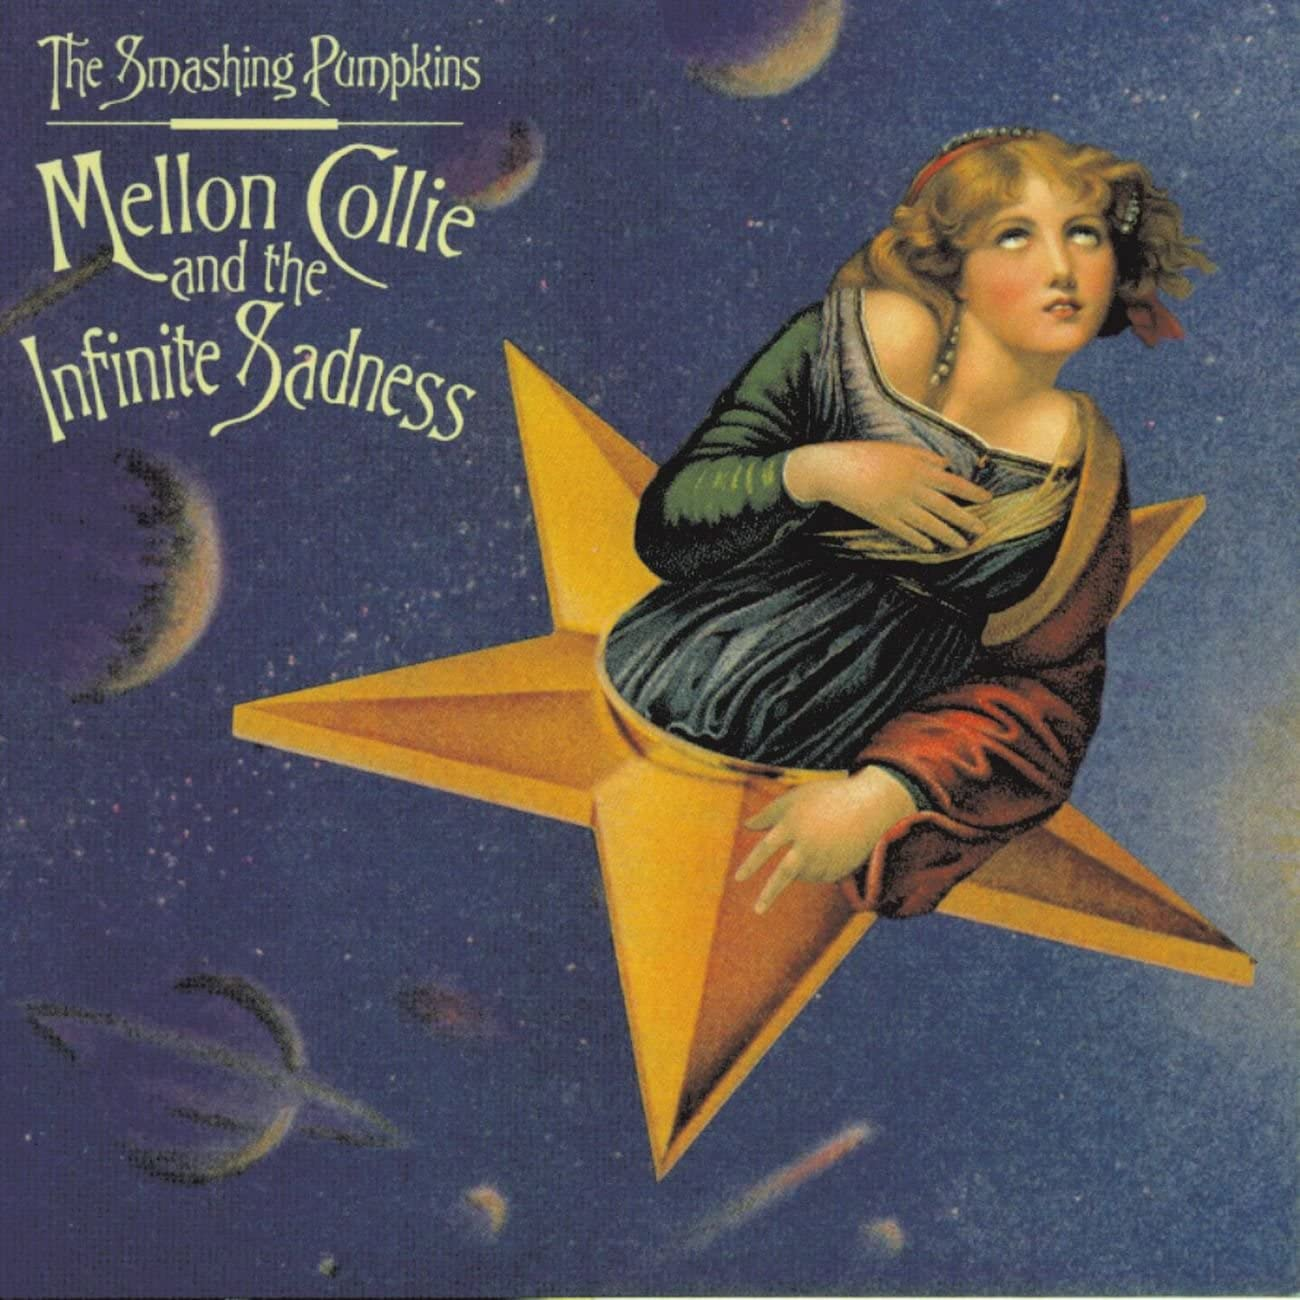 'Mellon Collie and the Infinite Sadness': El trabajo más ambicioso de The Smashing Pumpkins